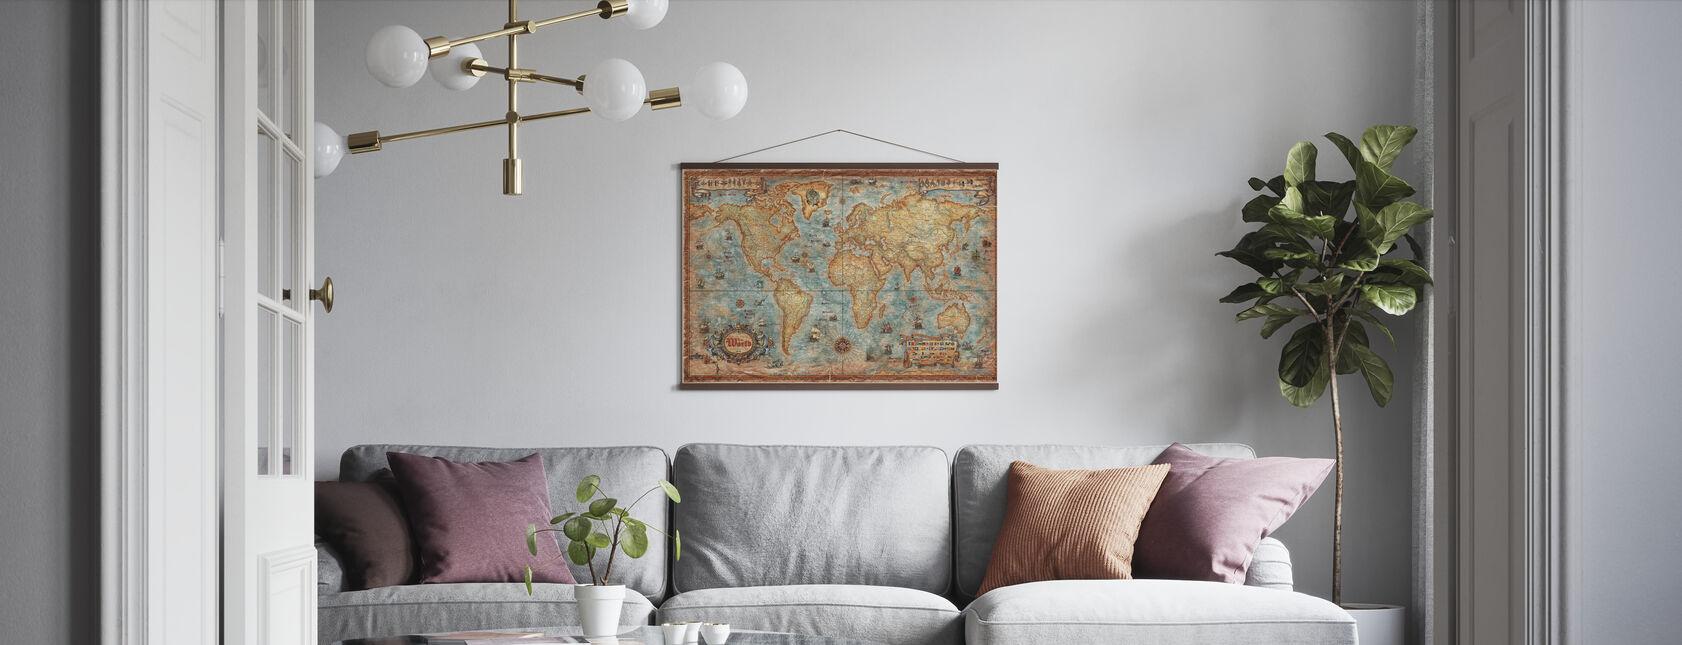 Modern World - Mappa antica - Poster - Salotto